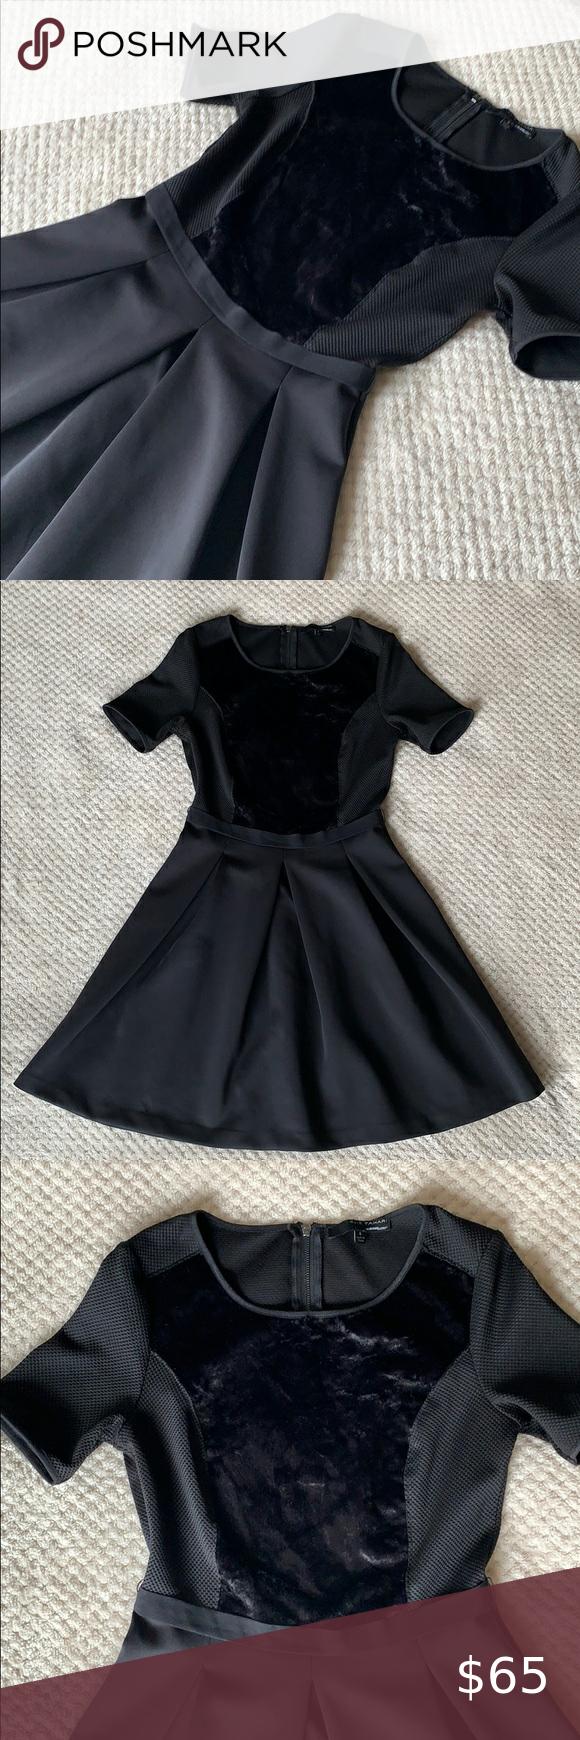 Elie Tahari Black Dress With Crushed Velvet Perfect Little Black Dress Clothes Design Tahari Dress [ 1740 x 580 Pixel ]